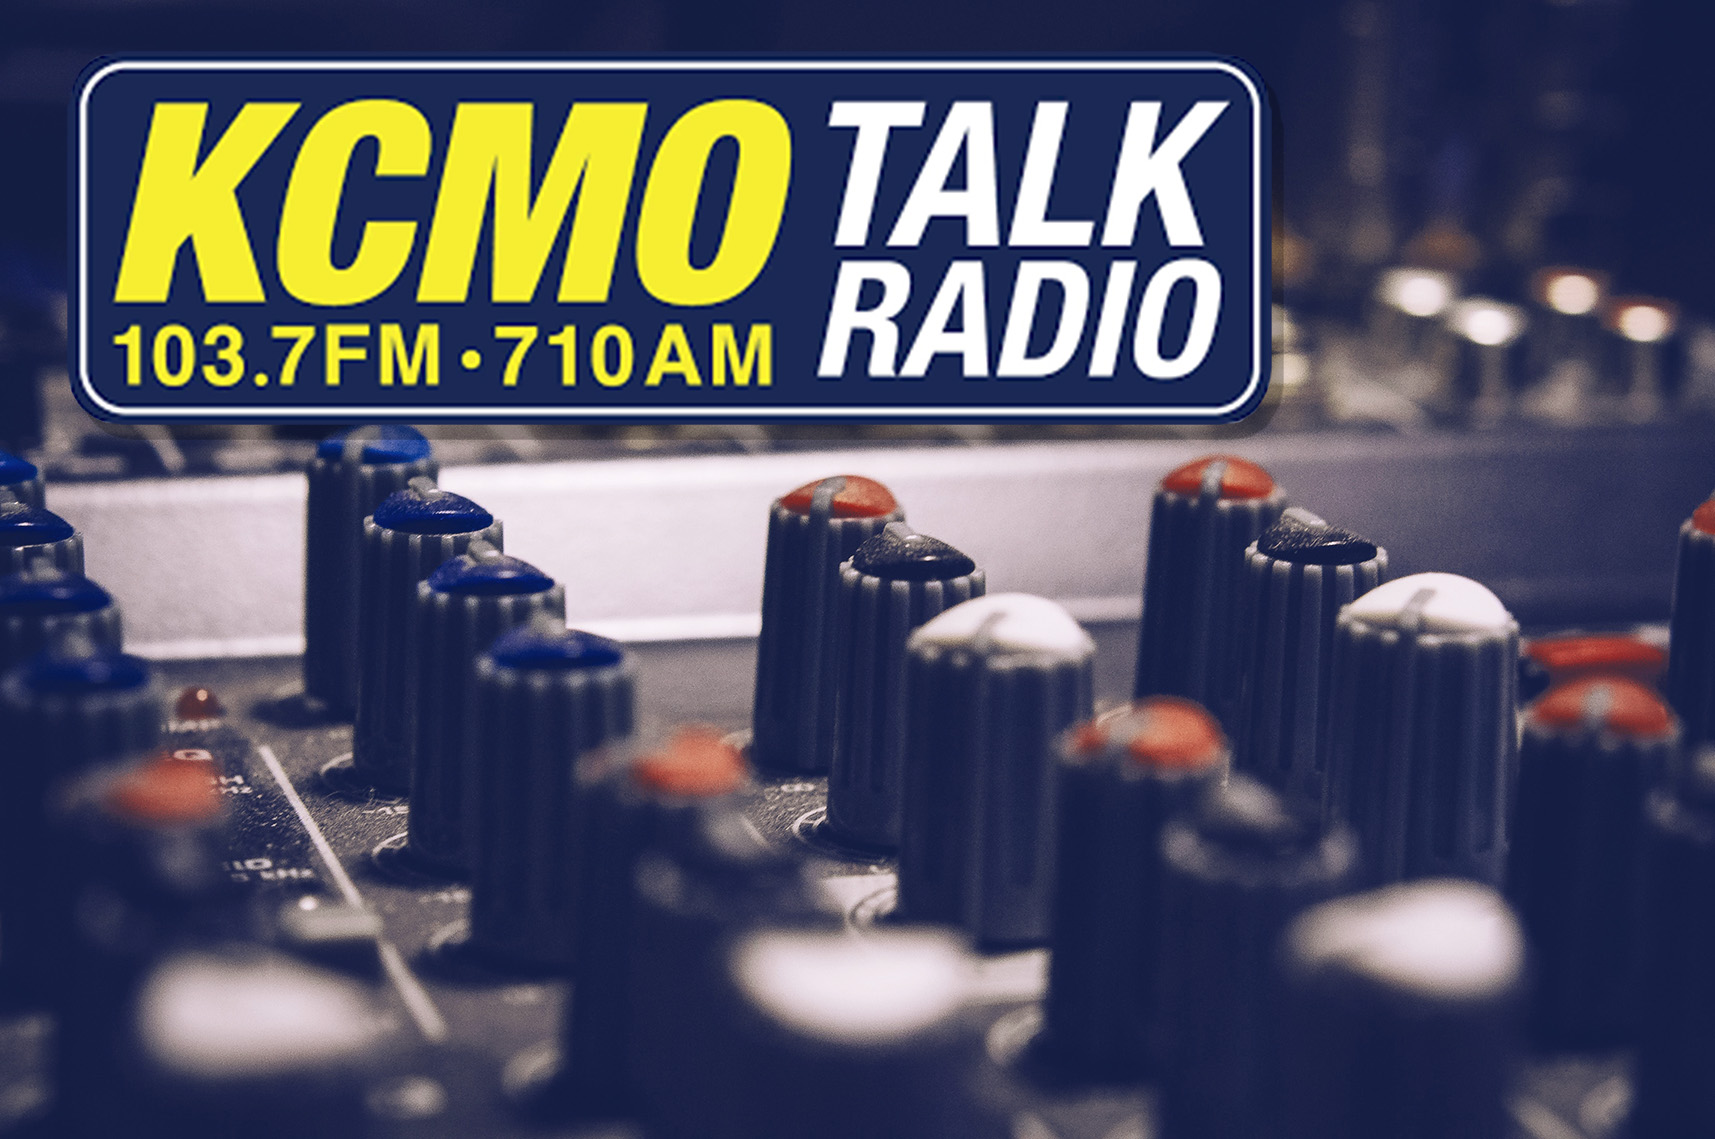 KCMO Talk Radio 710